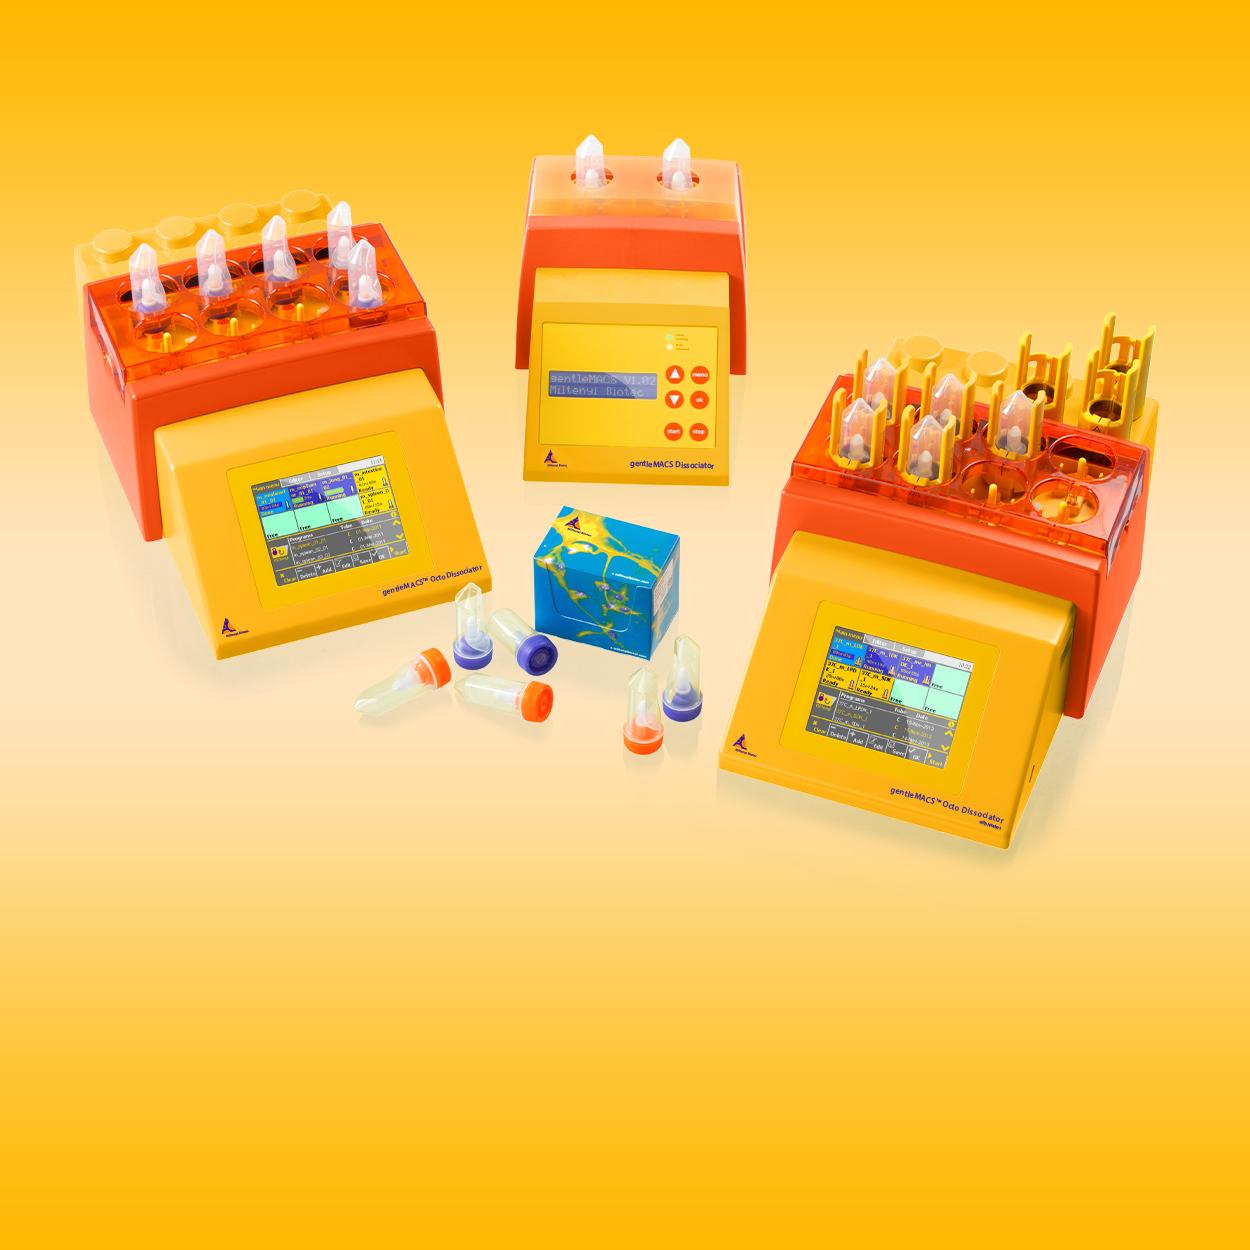 Tissue dissociators and tubes